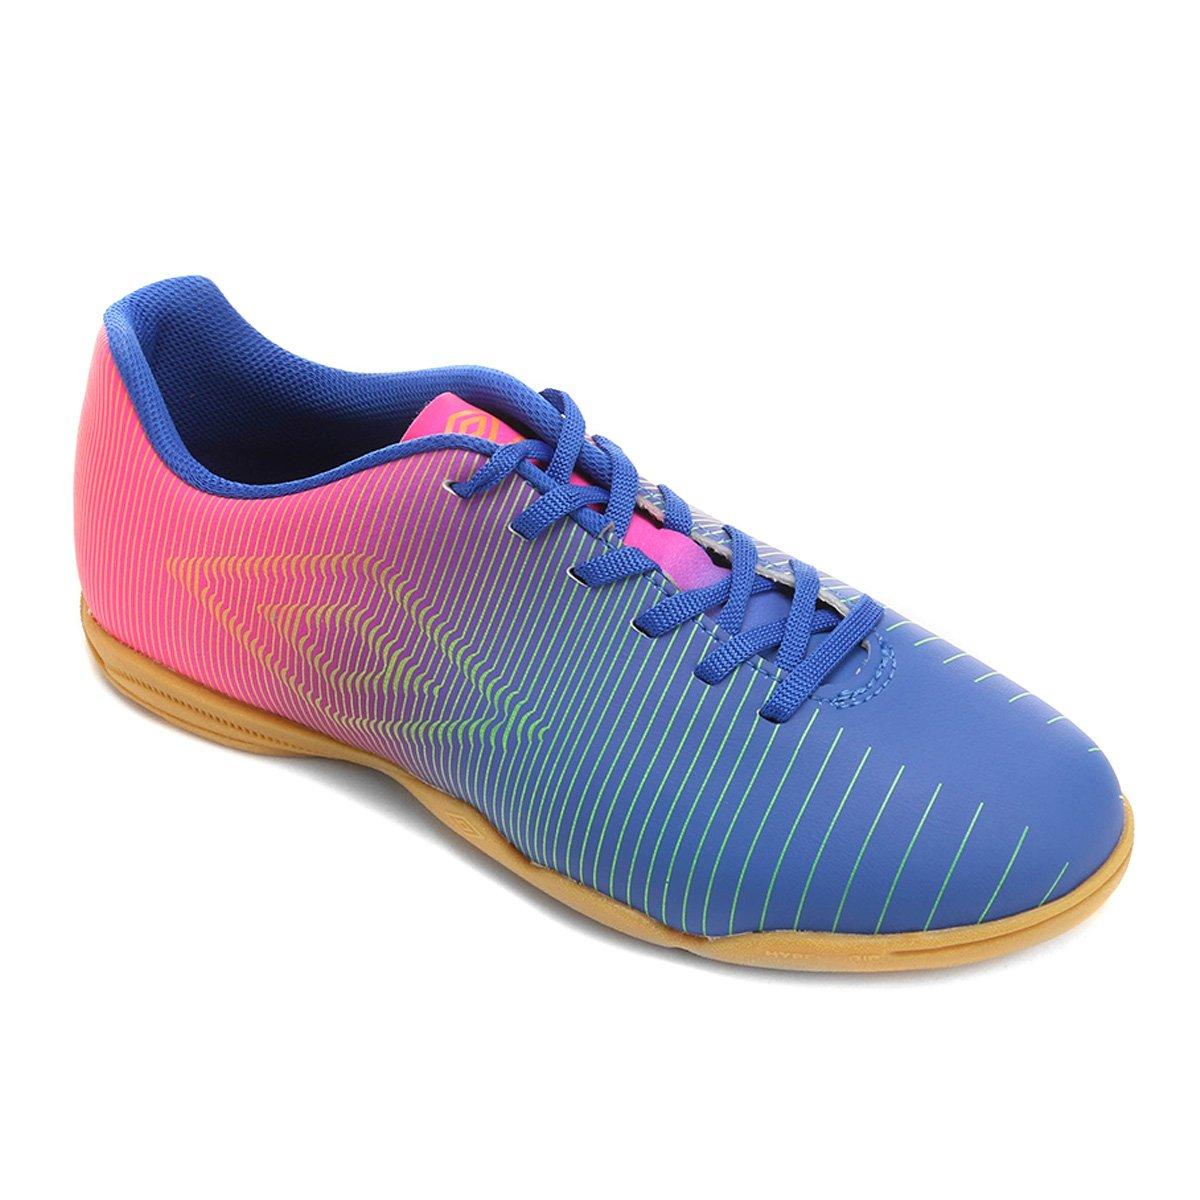 853a0abcd51d0 Chuteira Futsal Umbro Vibe Masculina - Compre Agora